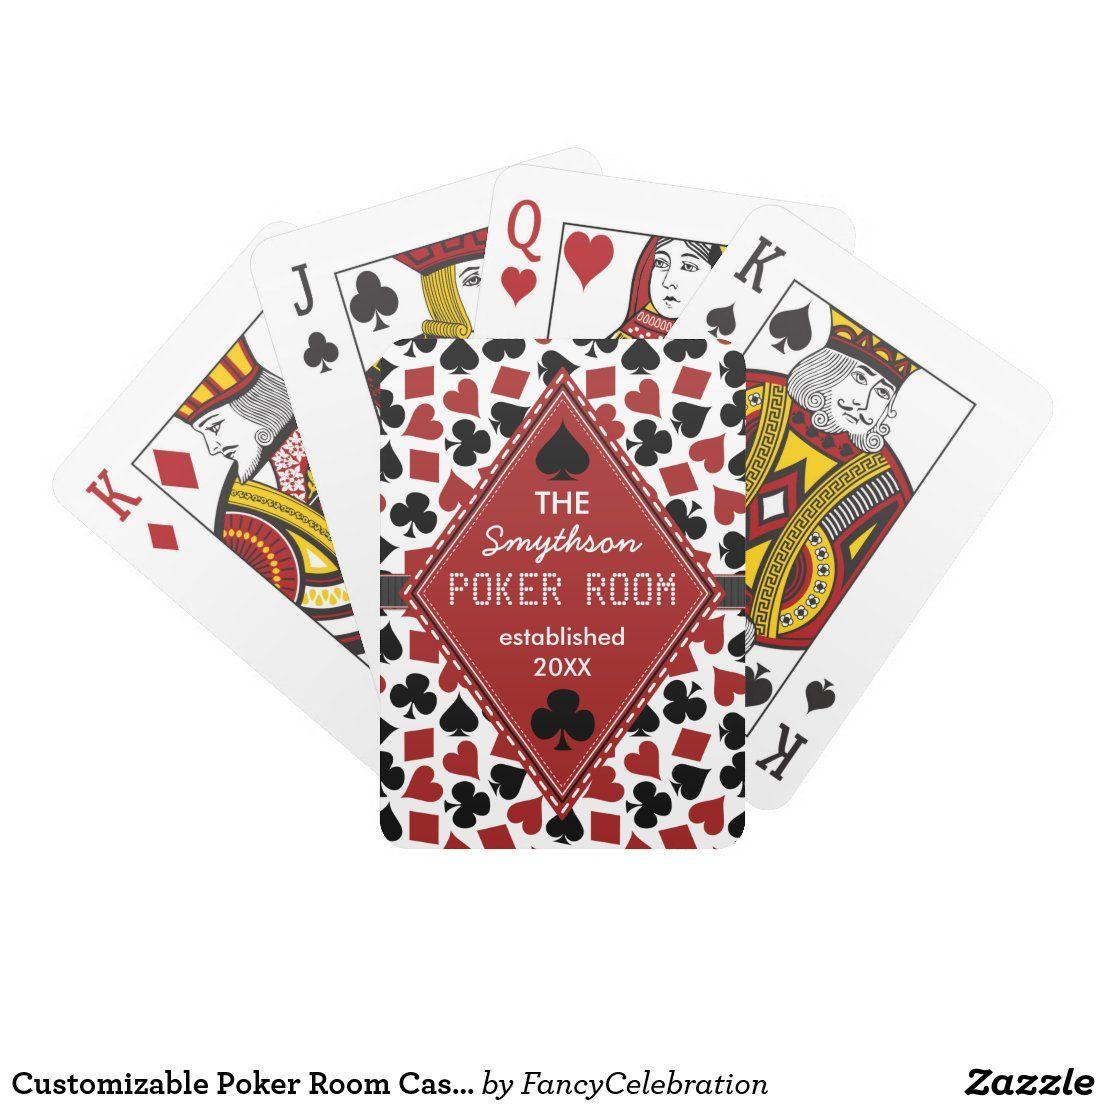 Customizable Poker Room Casino Custom Club Name Playing